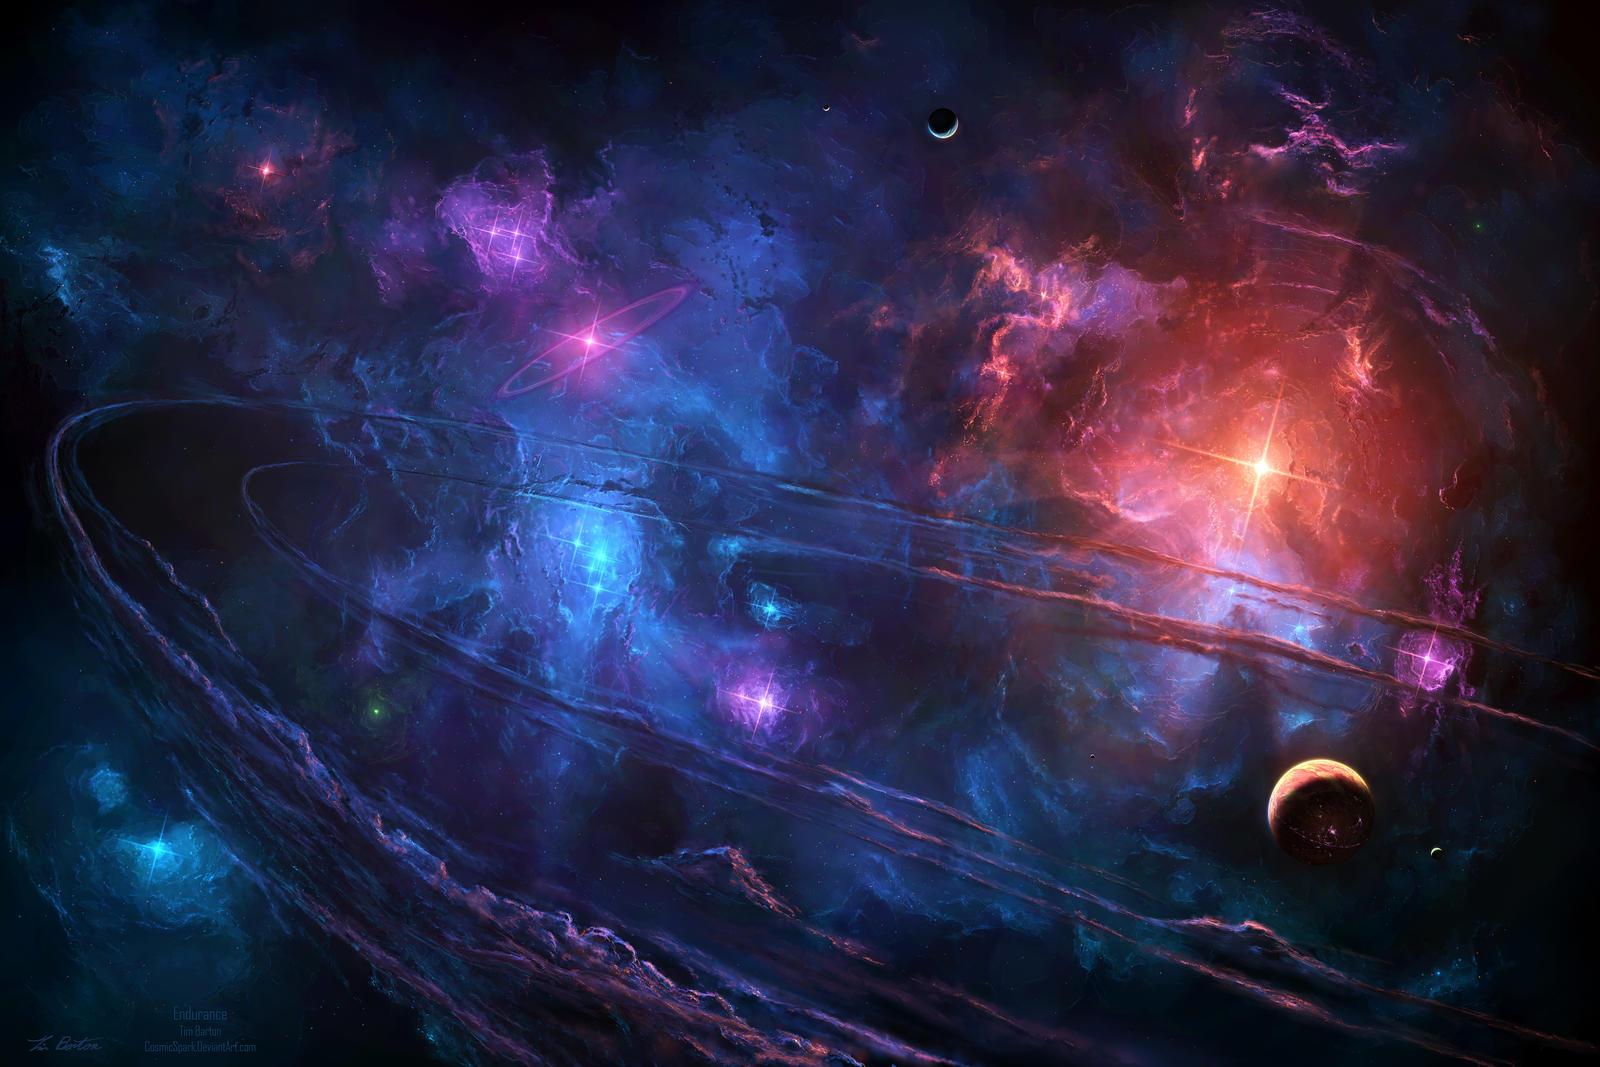 astronomy artists - photo #11